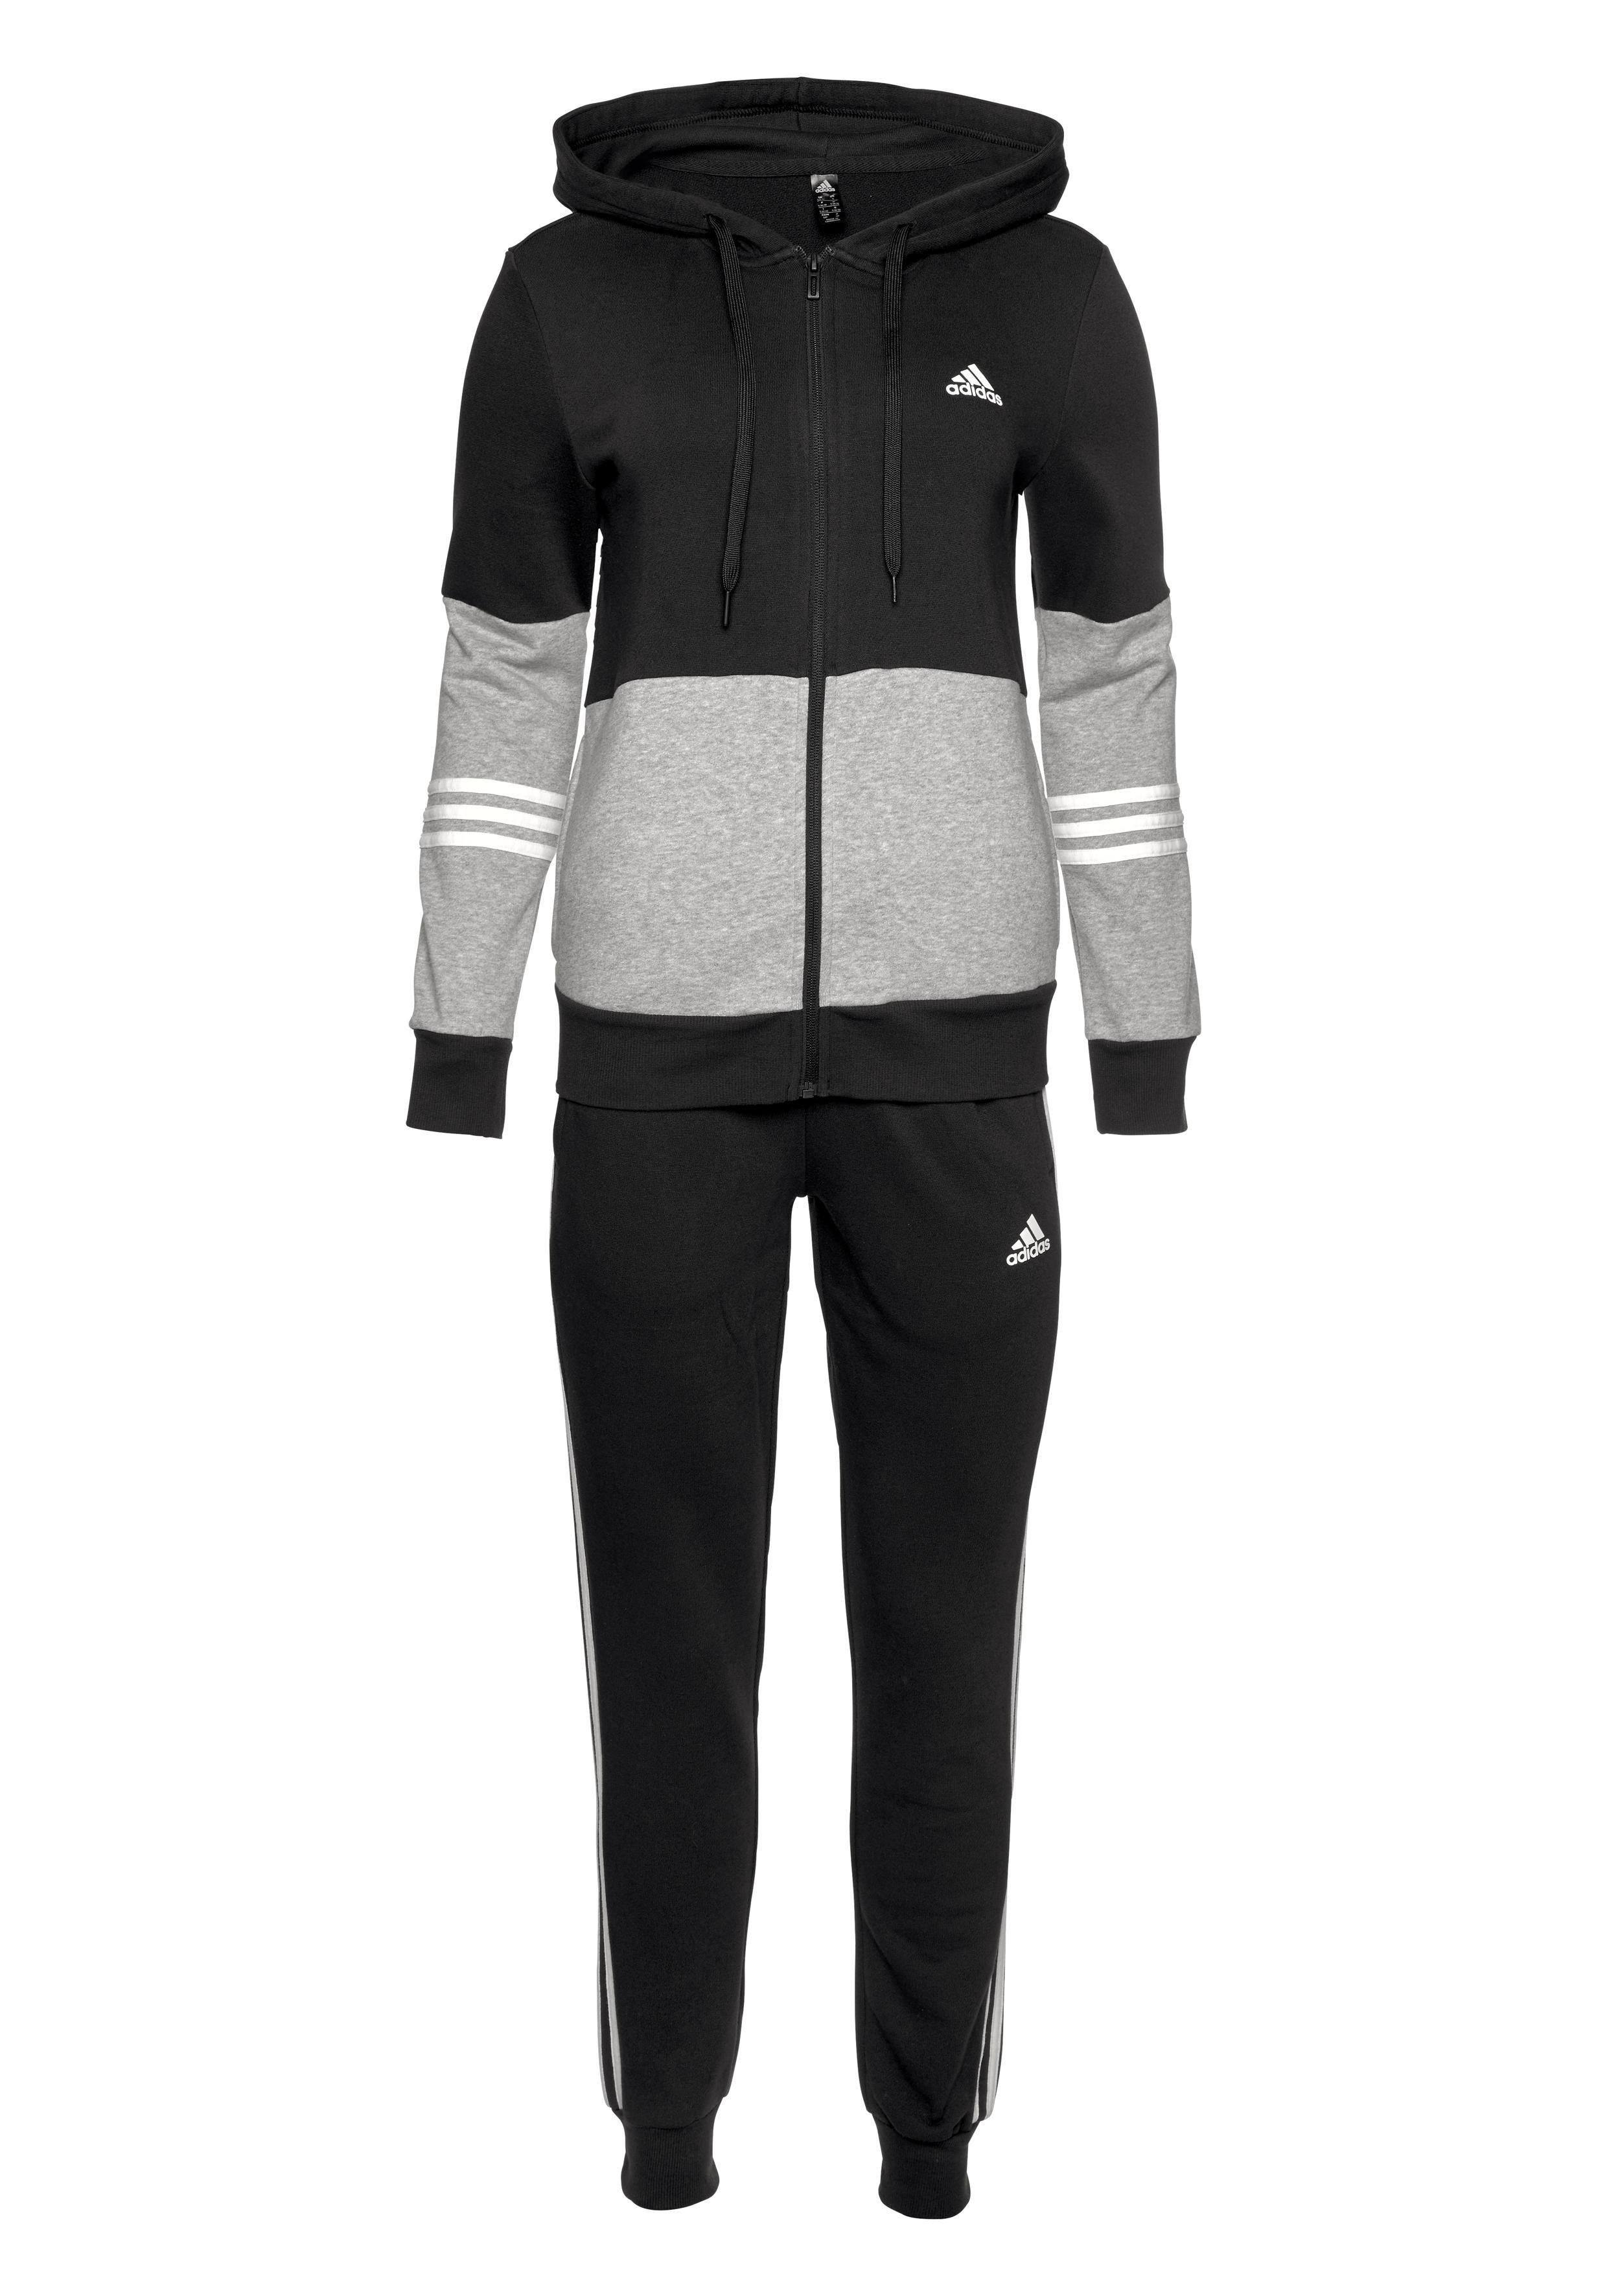 Joggingpaktracksuit Online Cotton Adidas Performance Energize Bij rBoeCdxW